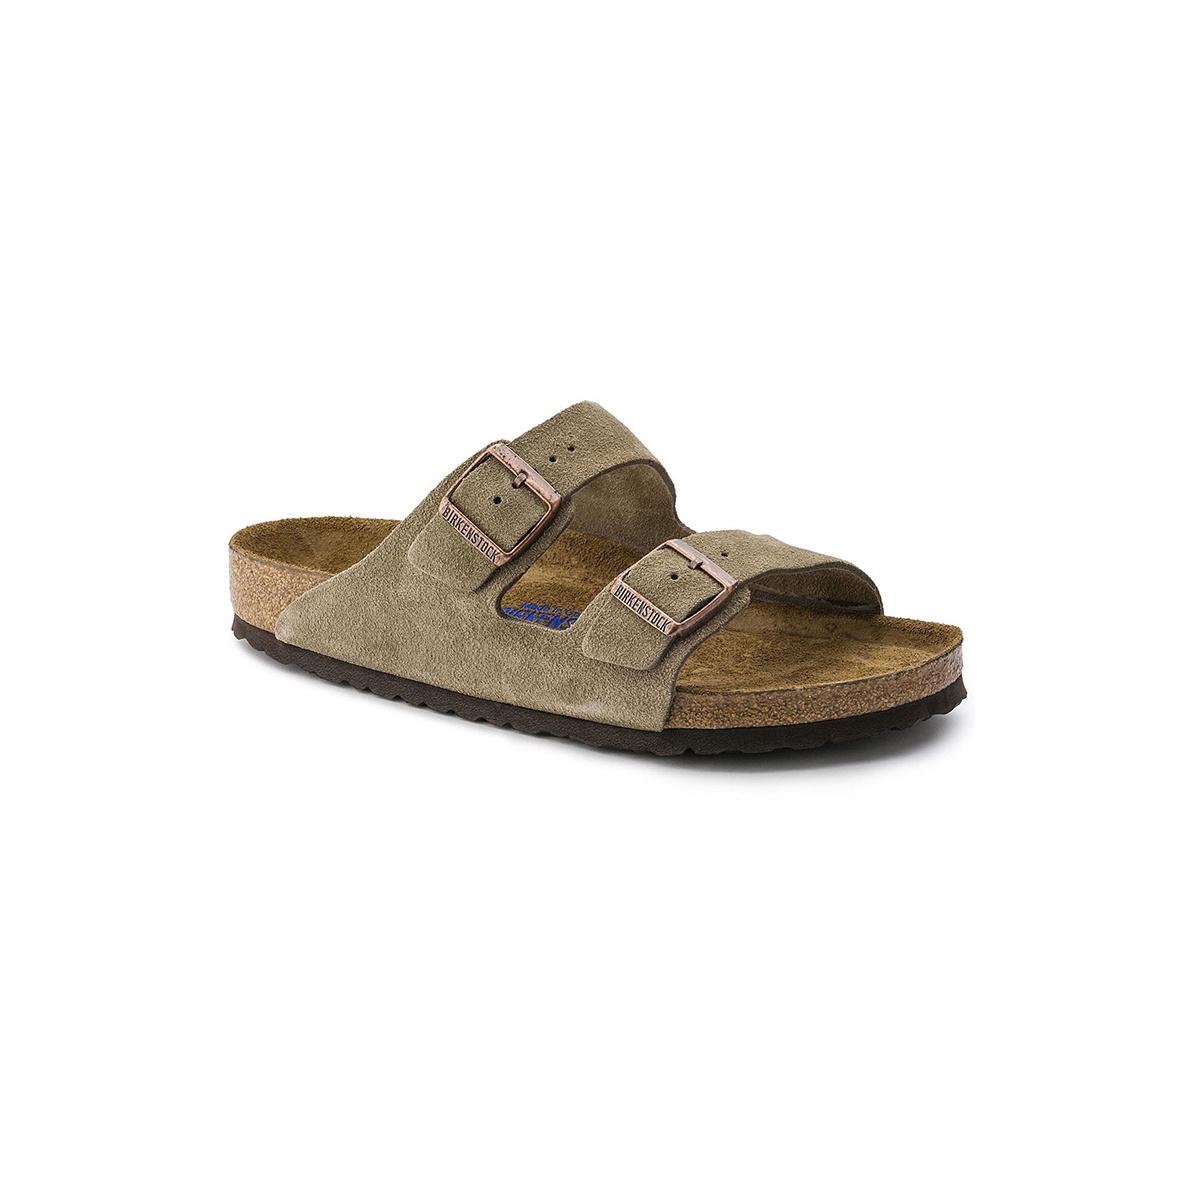 Birkenstock Arizona Soft Footbed Suede-Regular